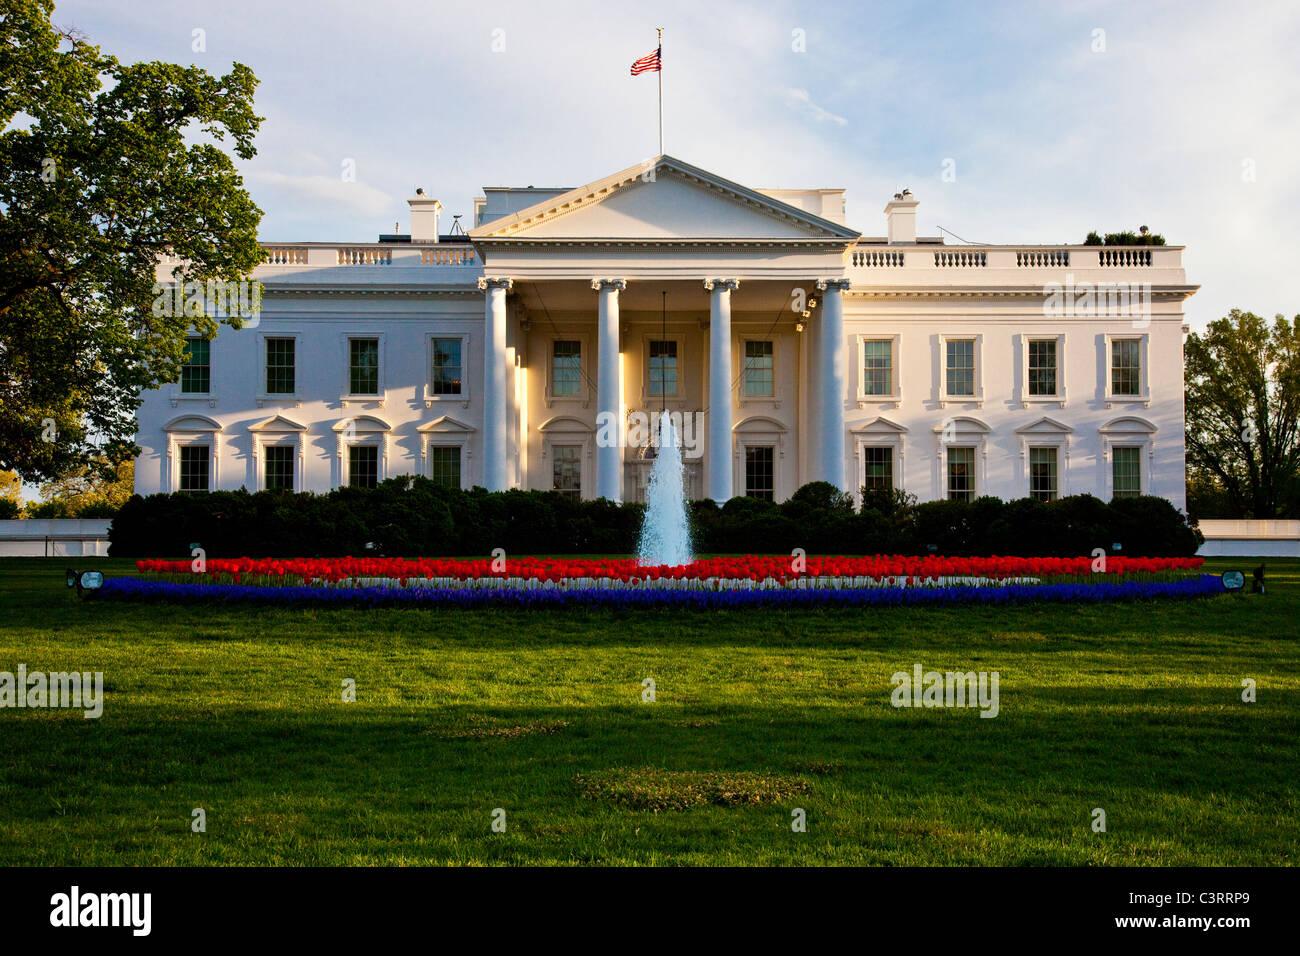 The White House, Washington DC - Stock Image